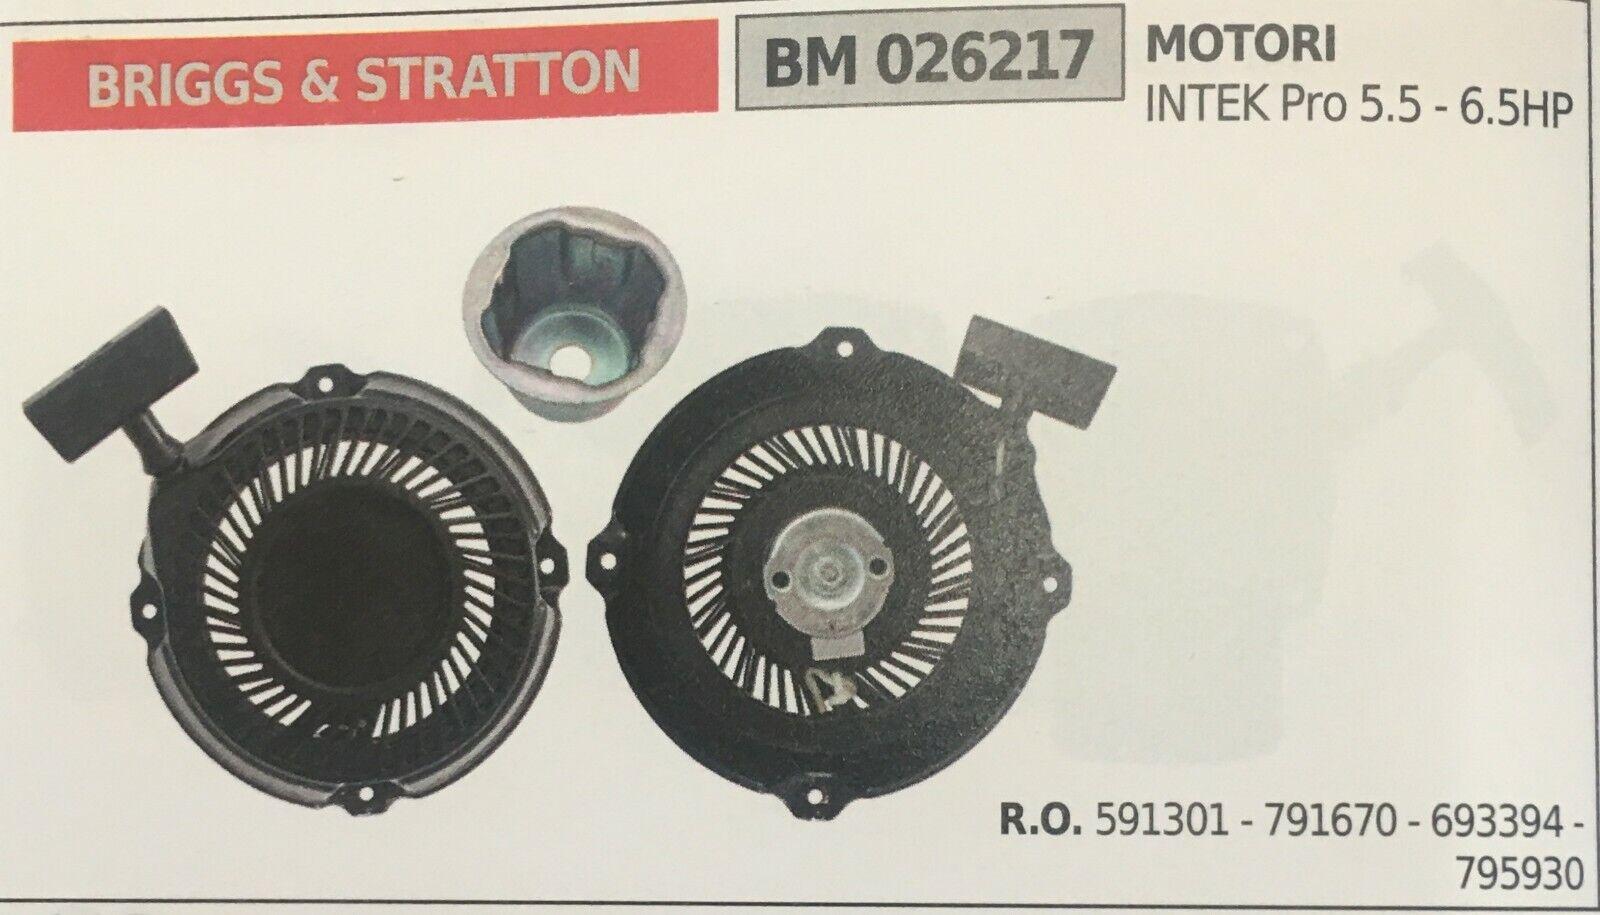 AVVIAMENTO COMPLETO BRUMAR BRIGGS & STRATTON BM026217